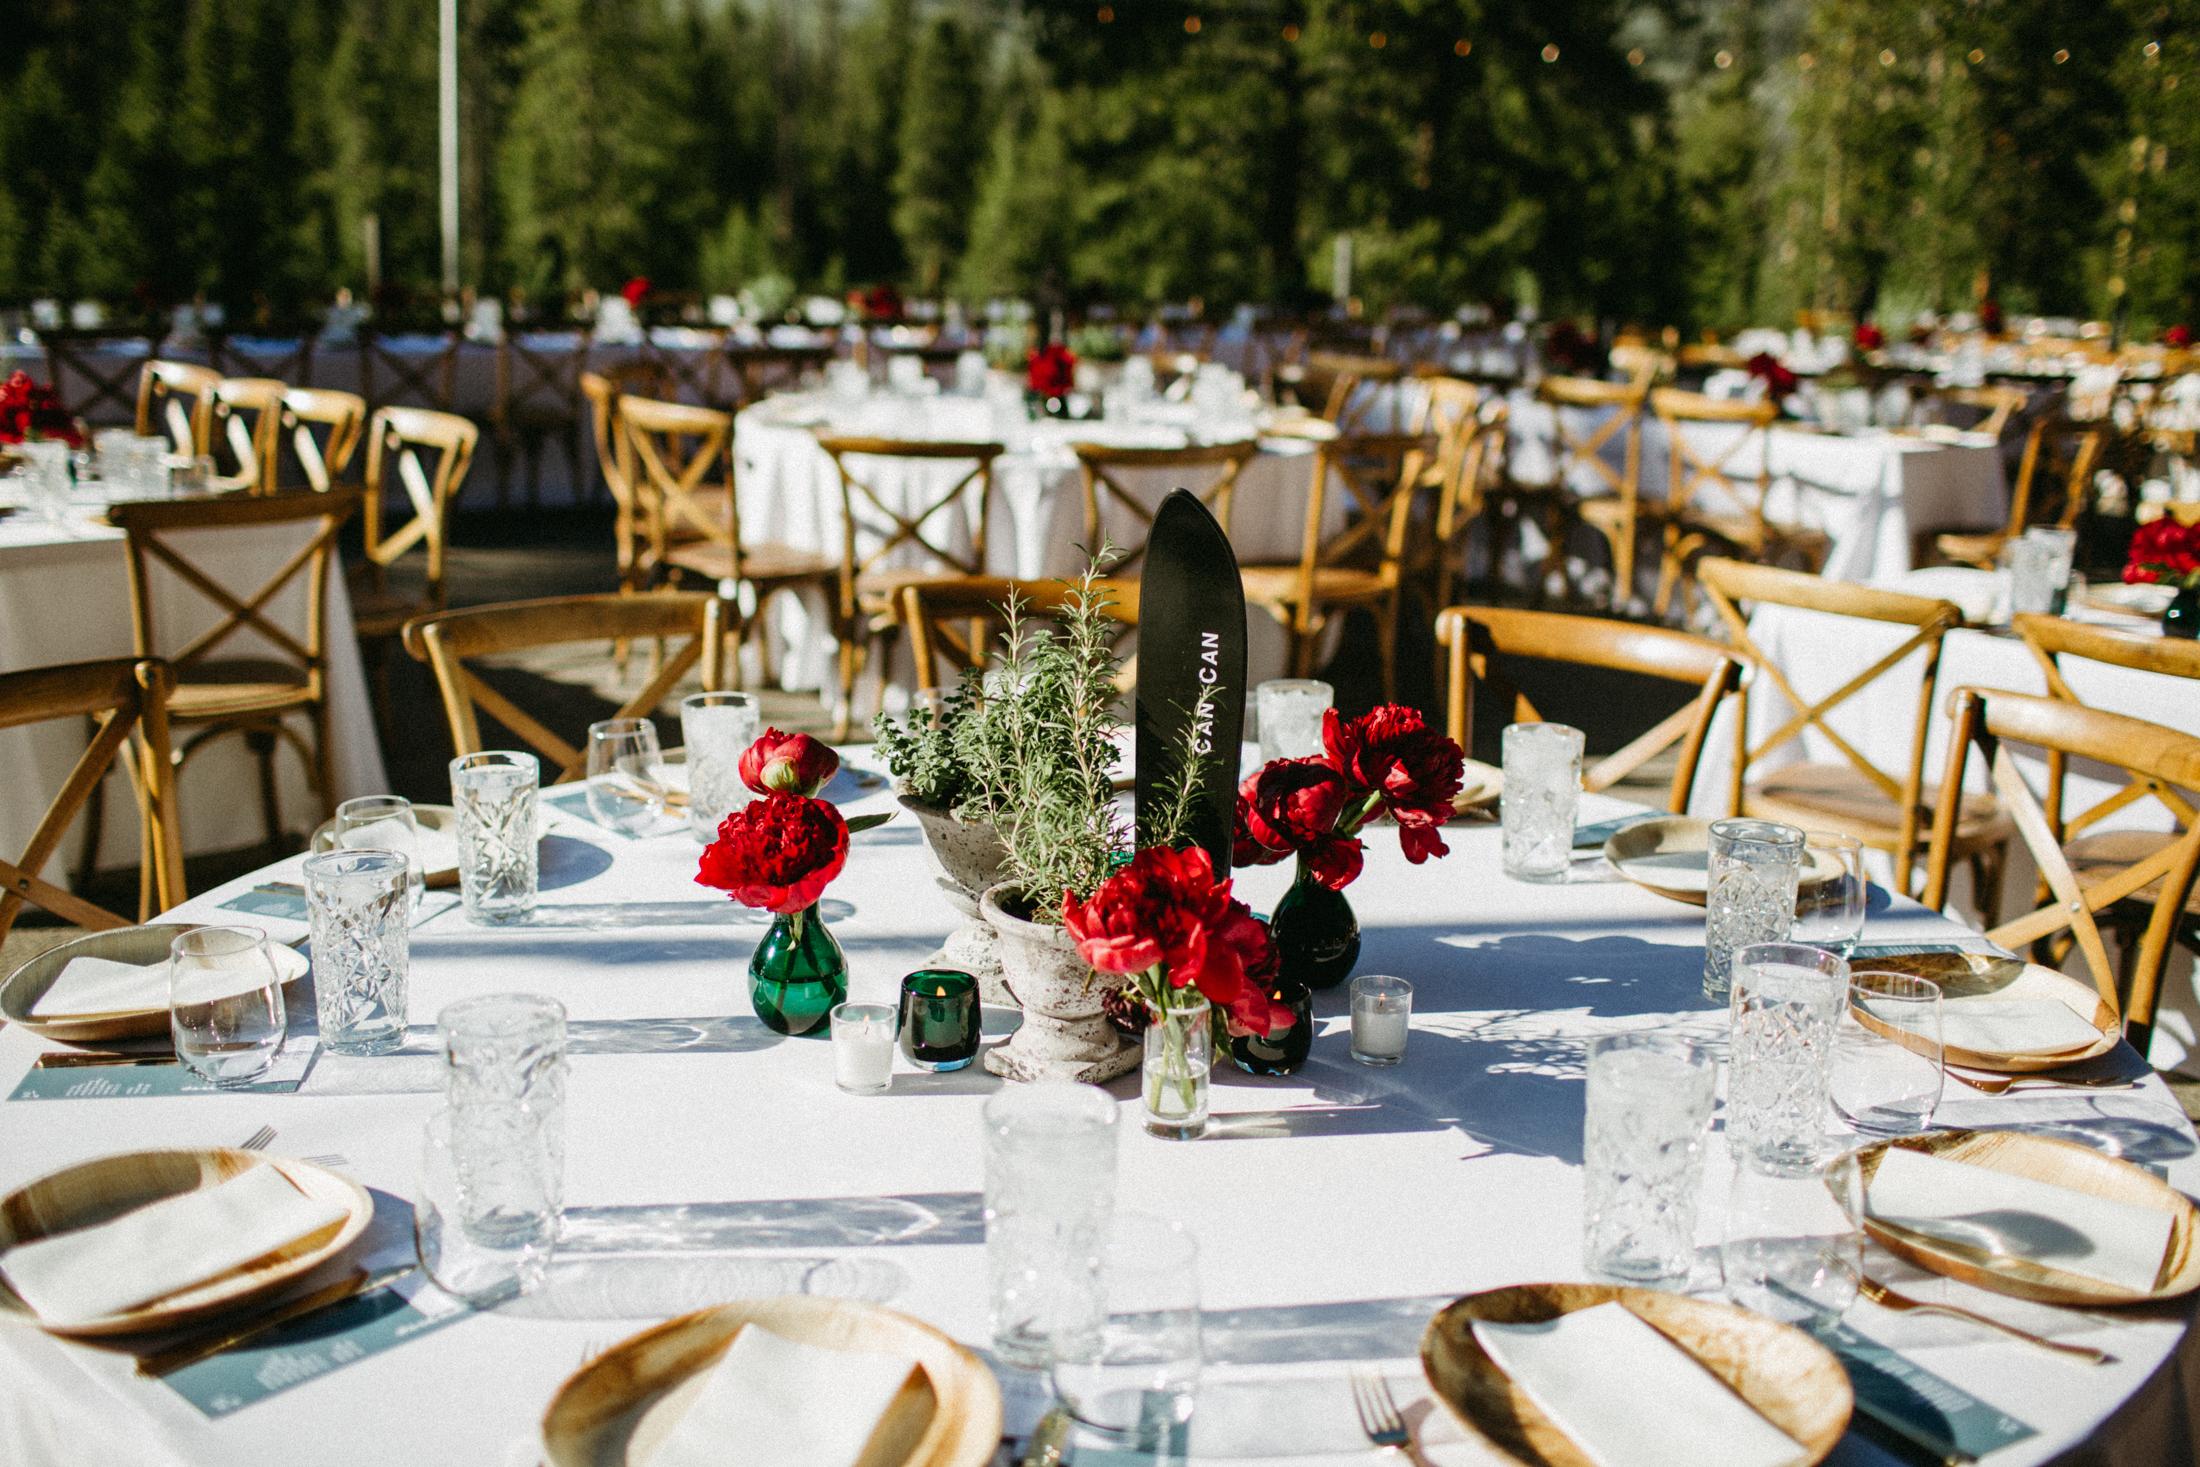 idaho-4h-camp-wedding-christinemarie-105.jpg